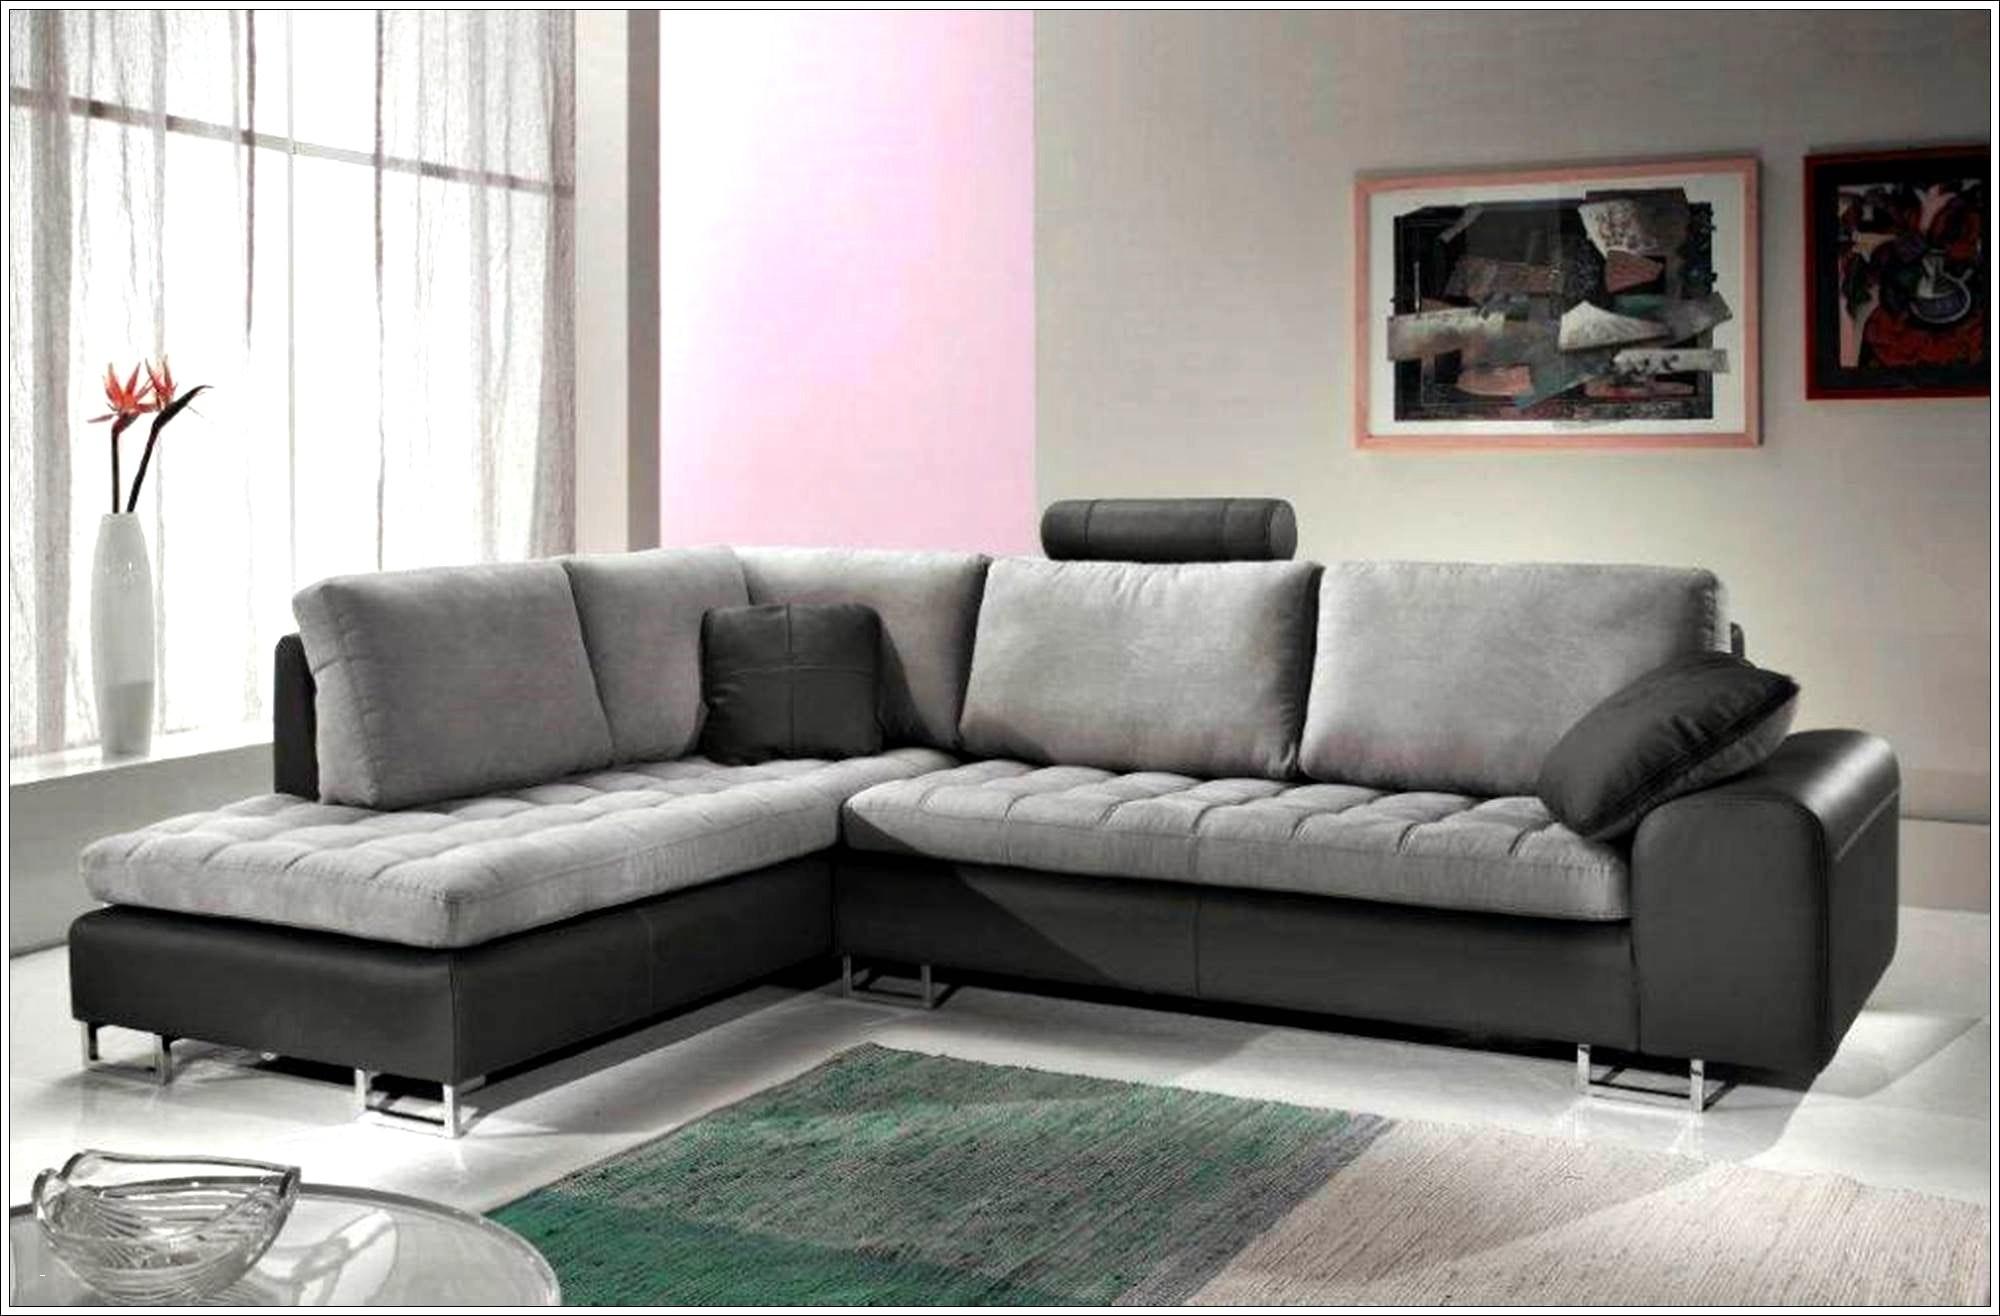 Canapé Imitation Cuir Vieilli Beau Image 27 Superbe Canapé Convertible Design Design De Maison